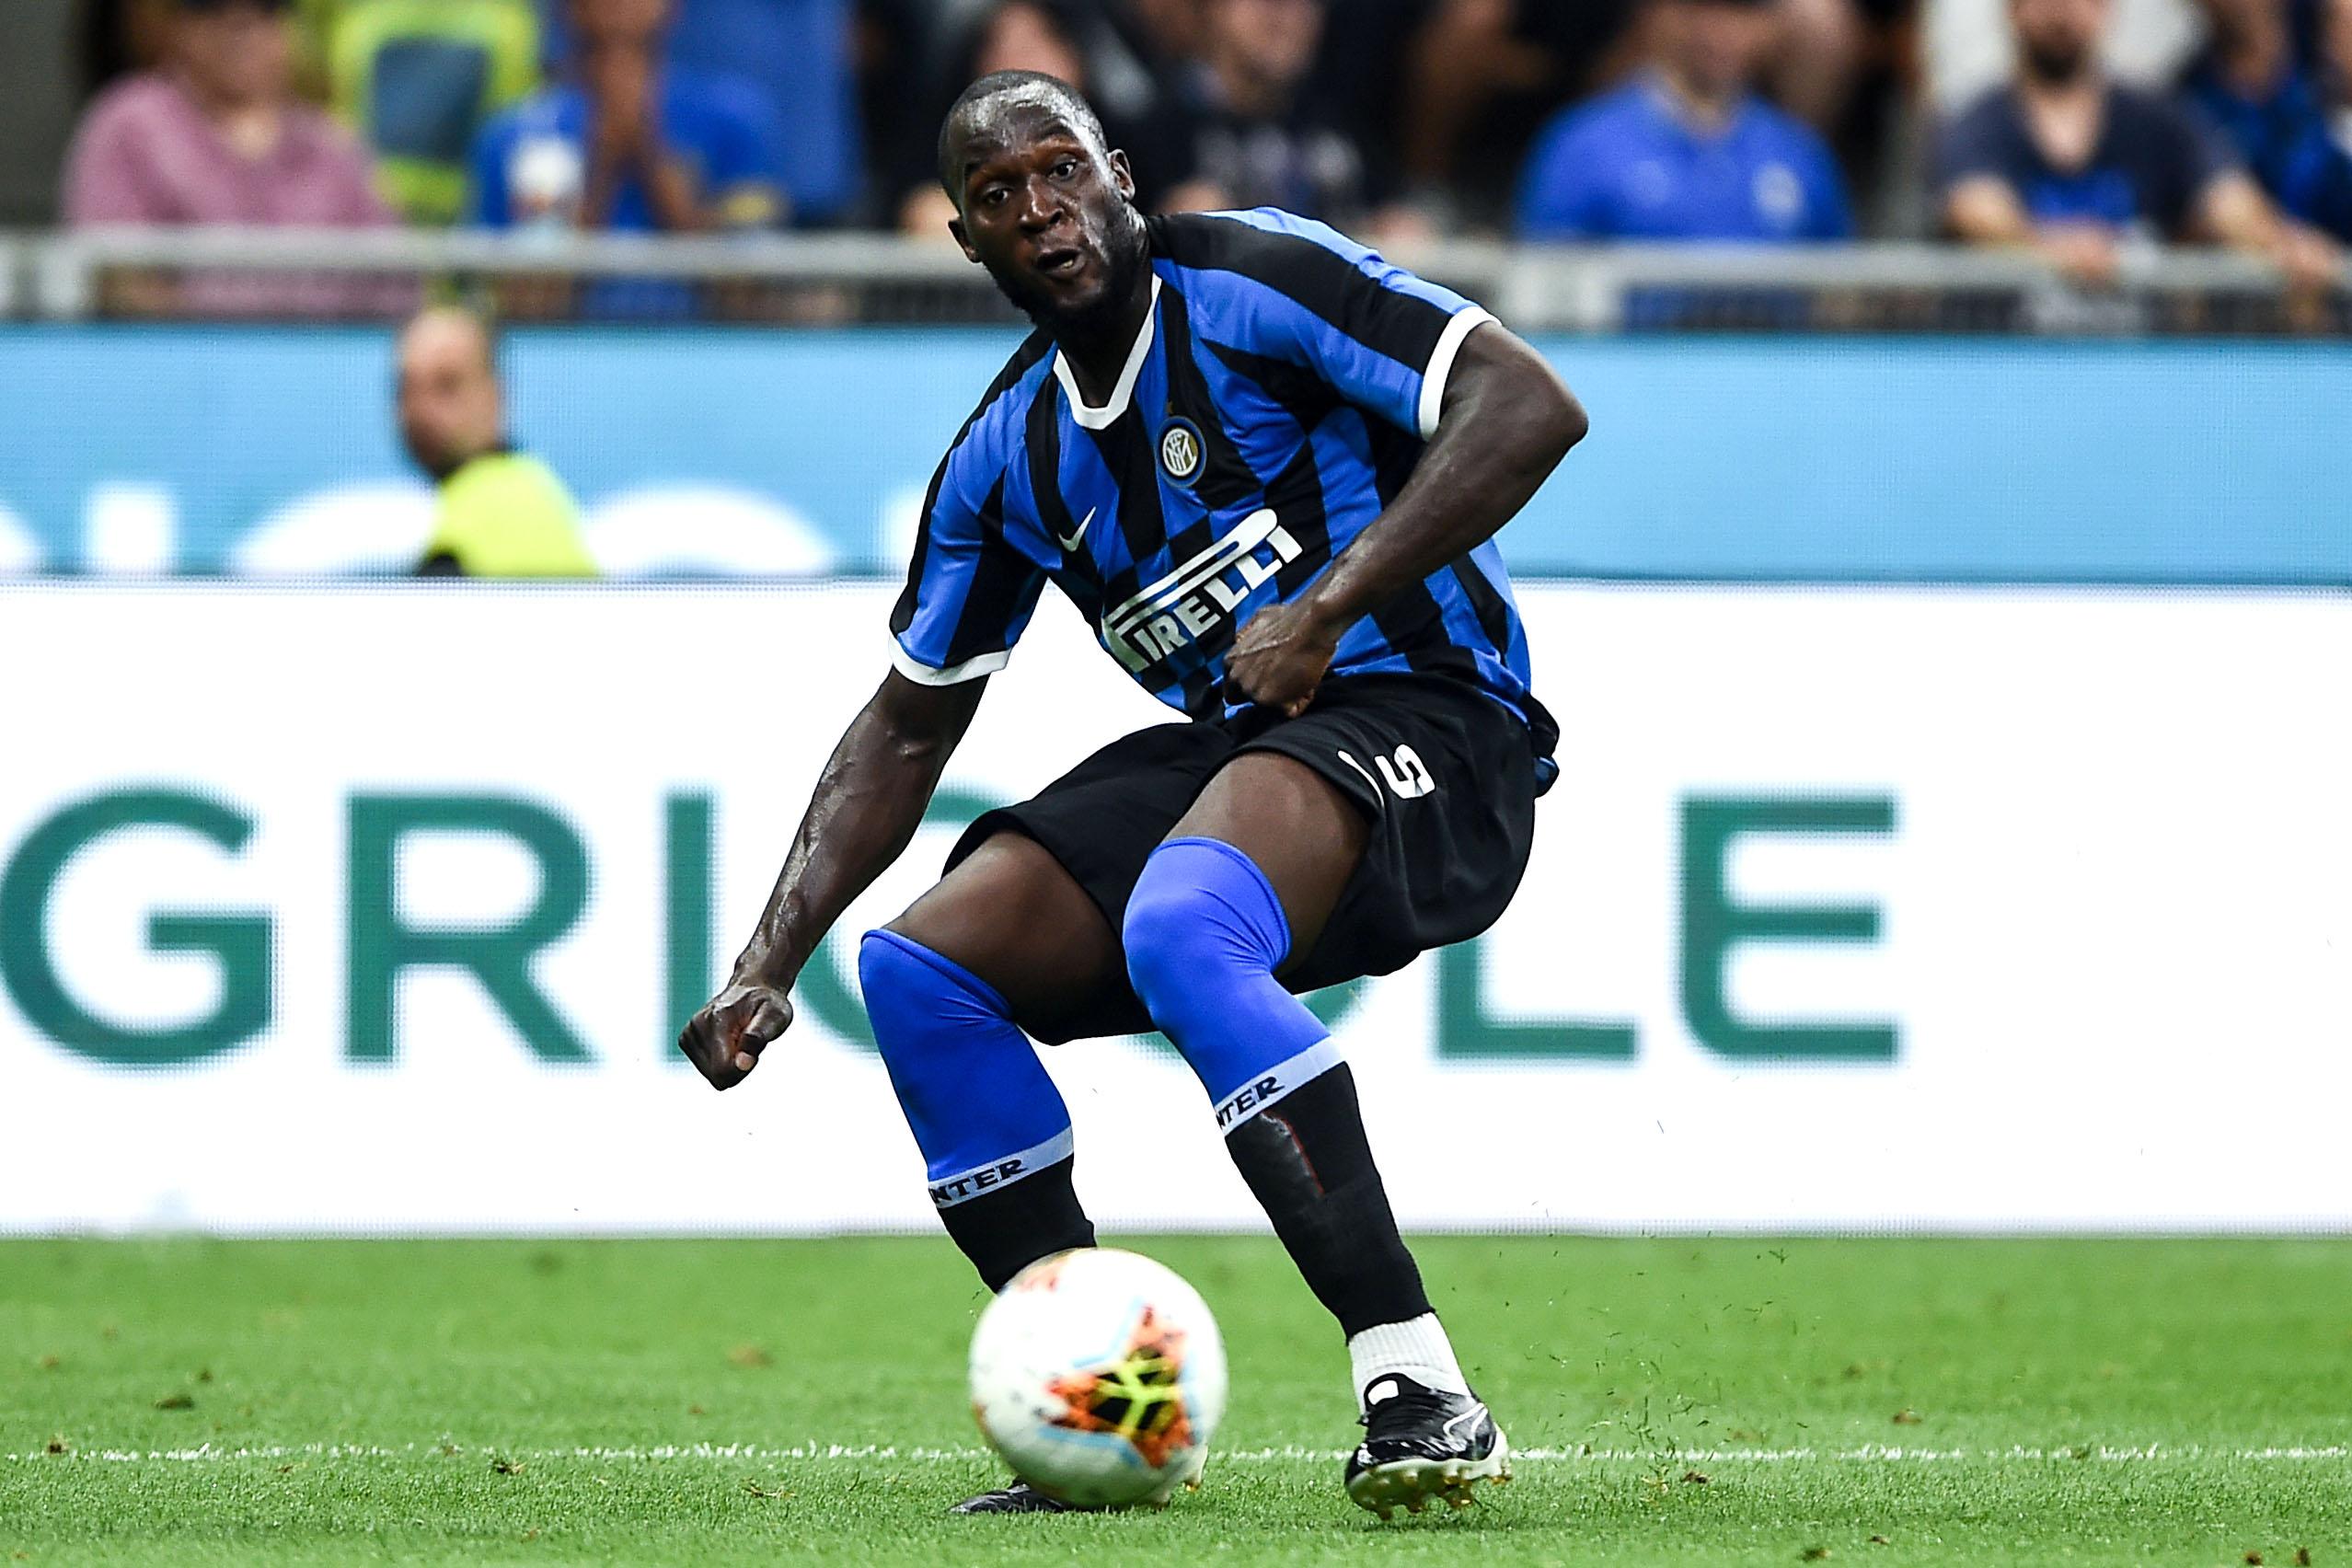 Football - Ligue des champions - Ligue des champions : Inter Milan-Slavia Prague en direct